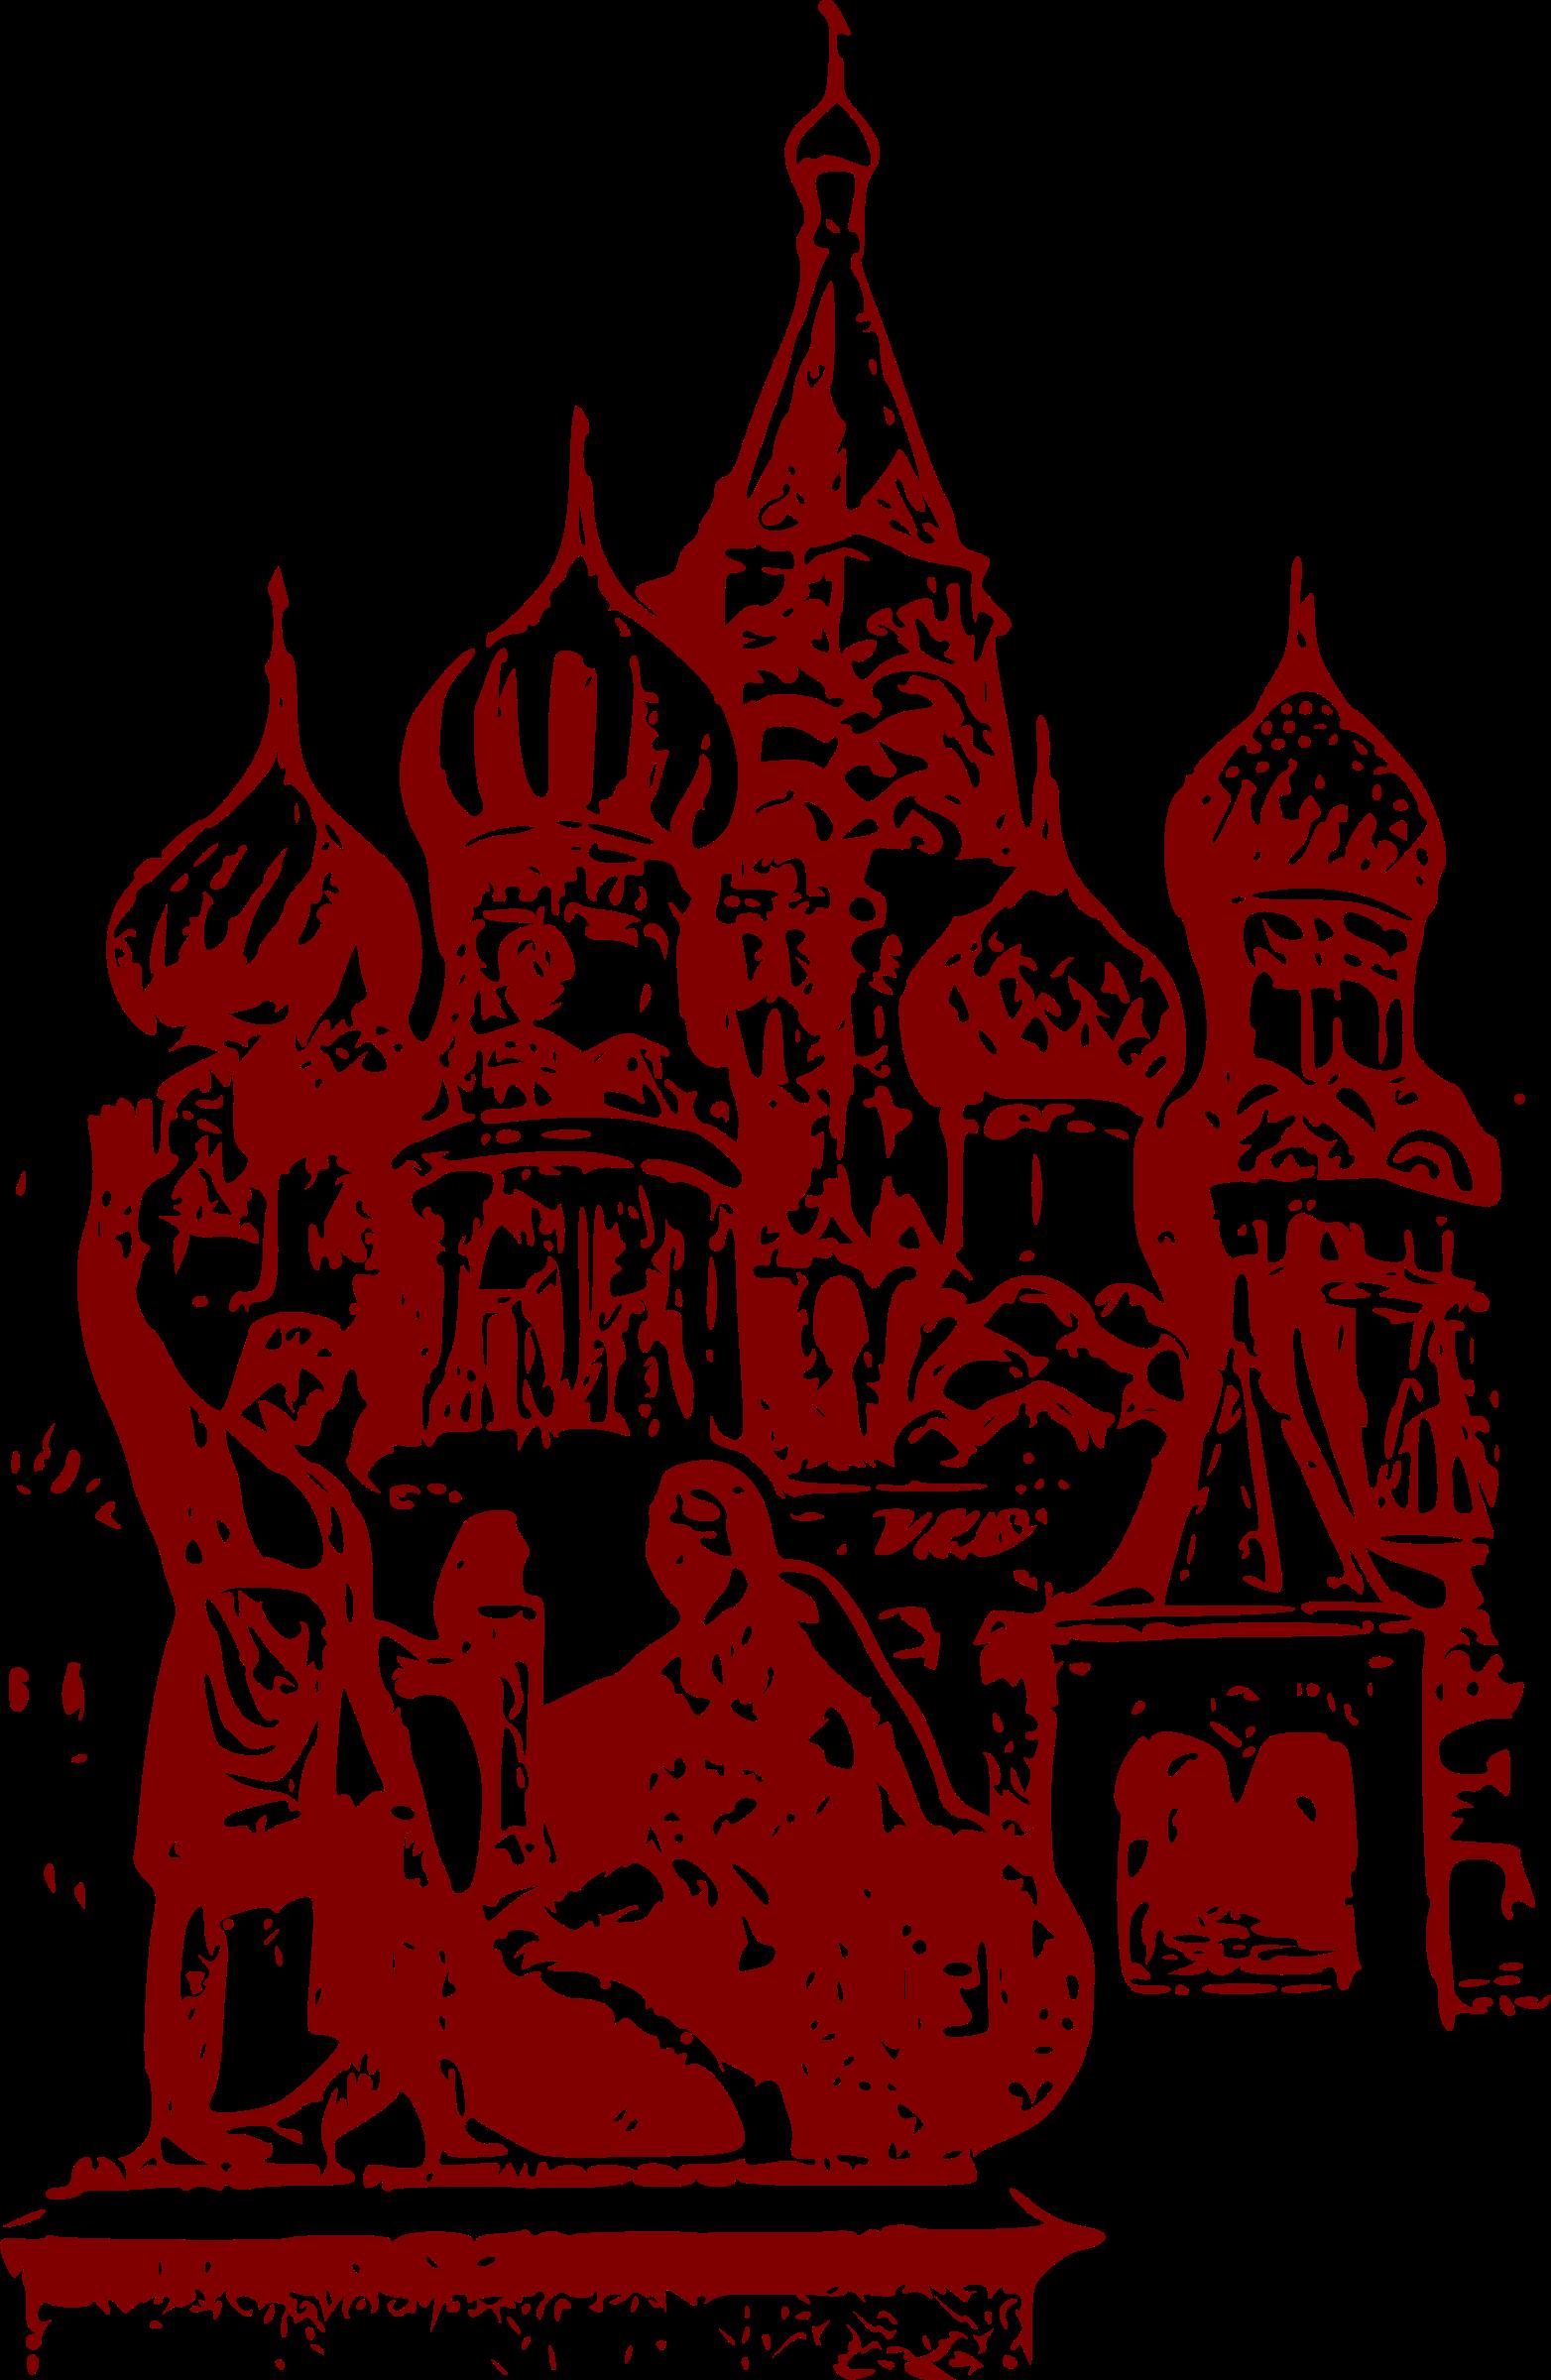 Clipart castle russian. Hd image russia transparentpng